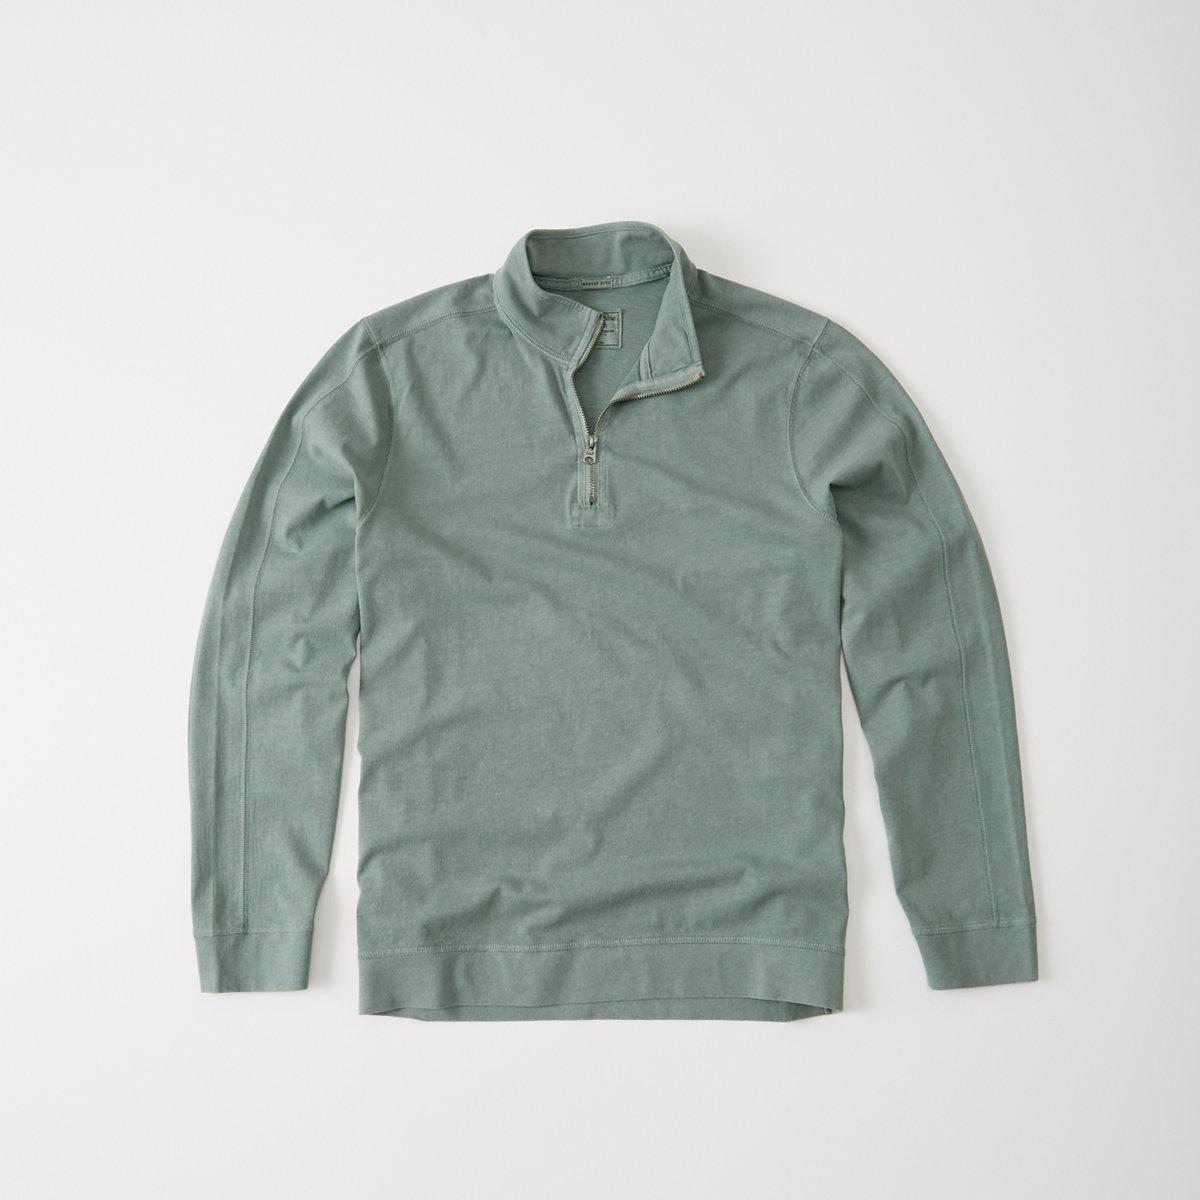 Garment Dye Half-Zip Pullover